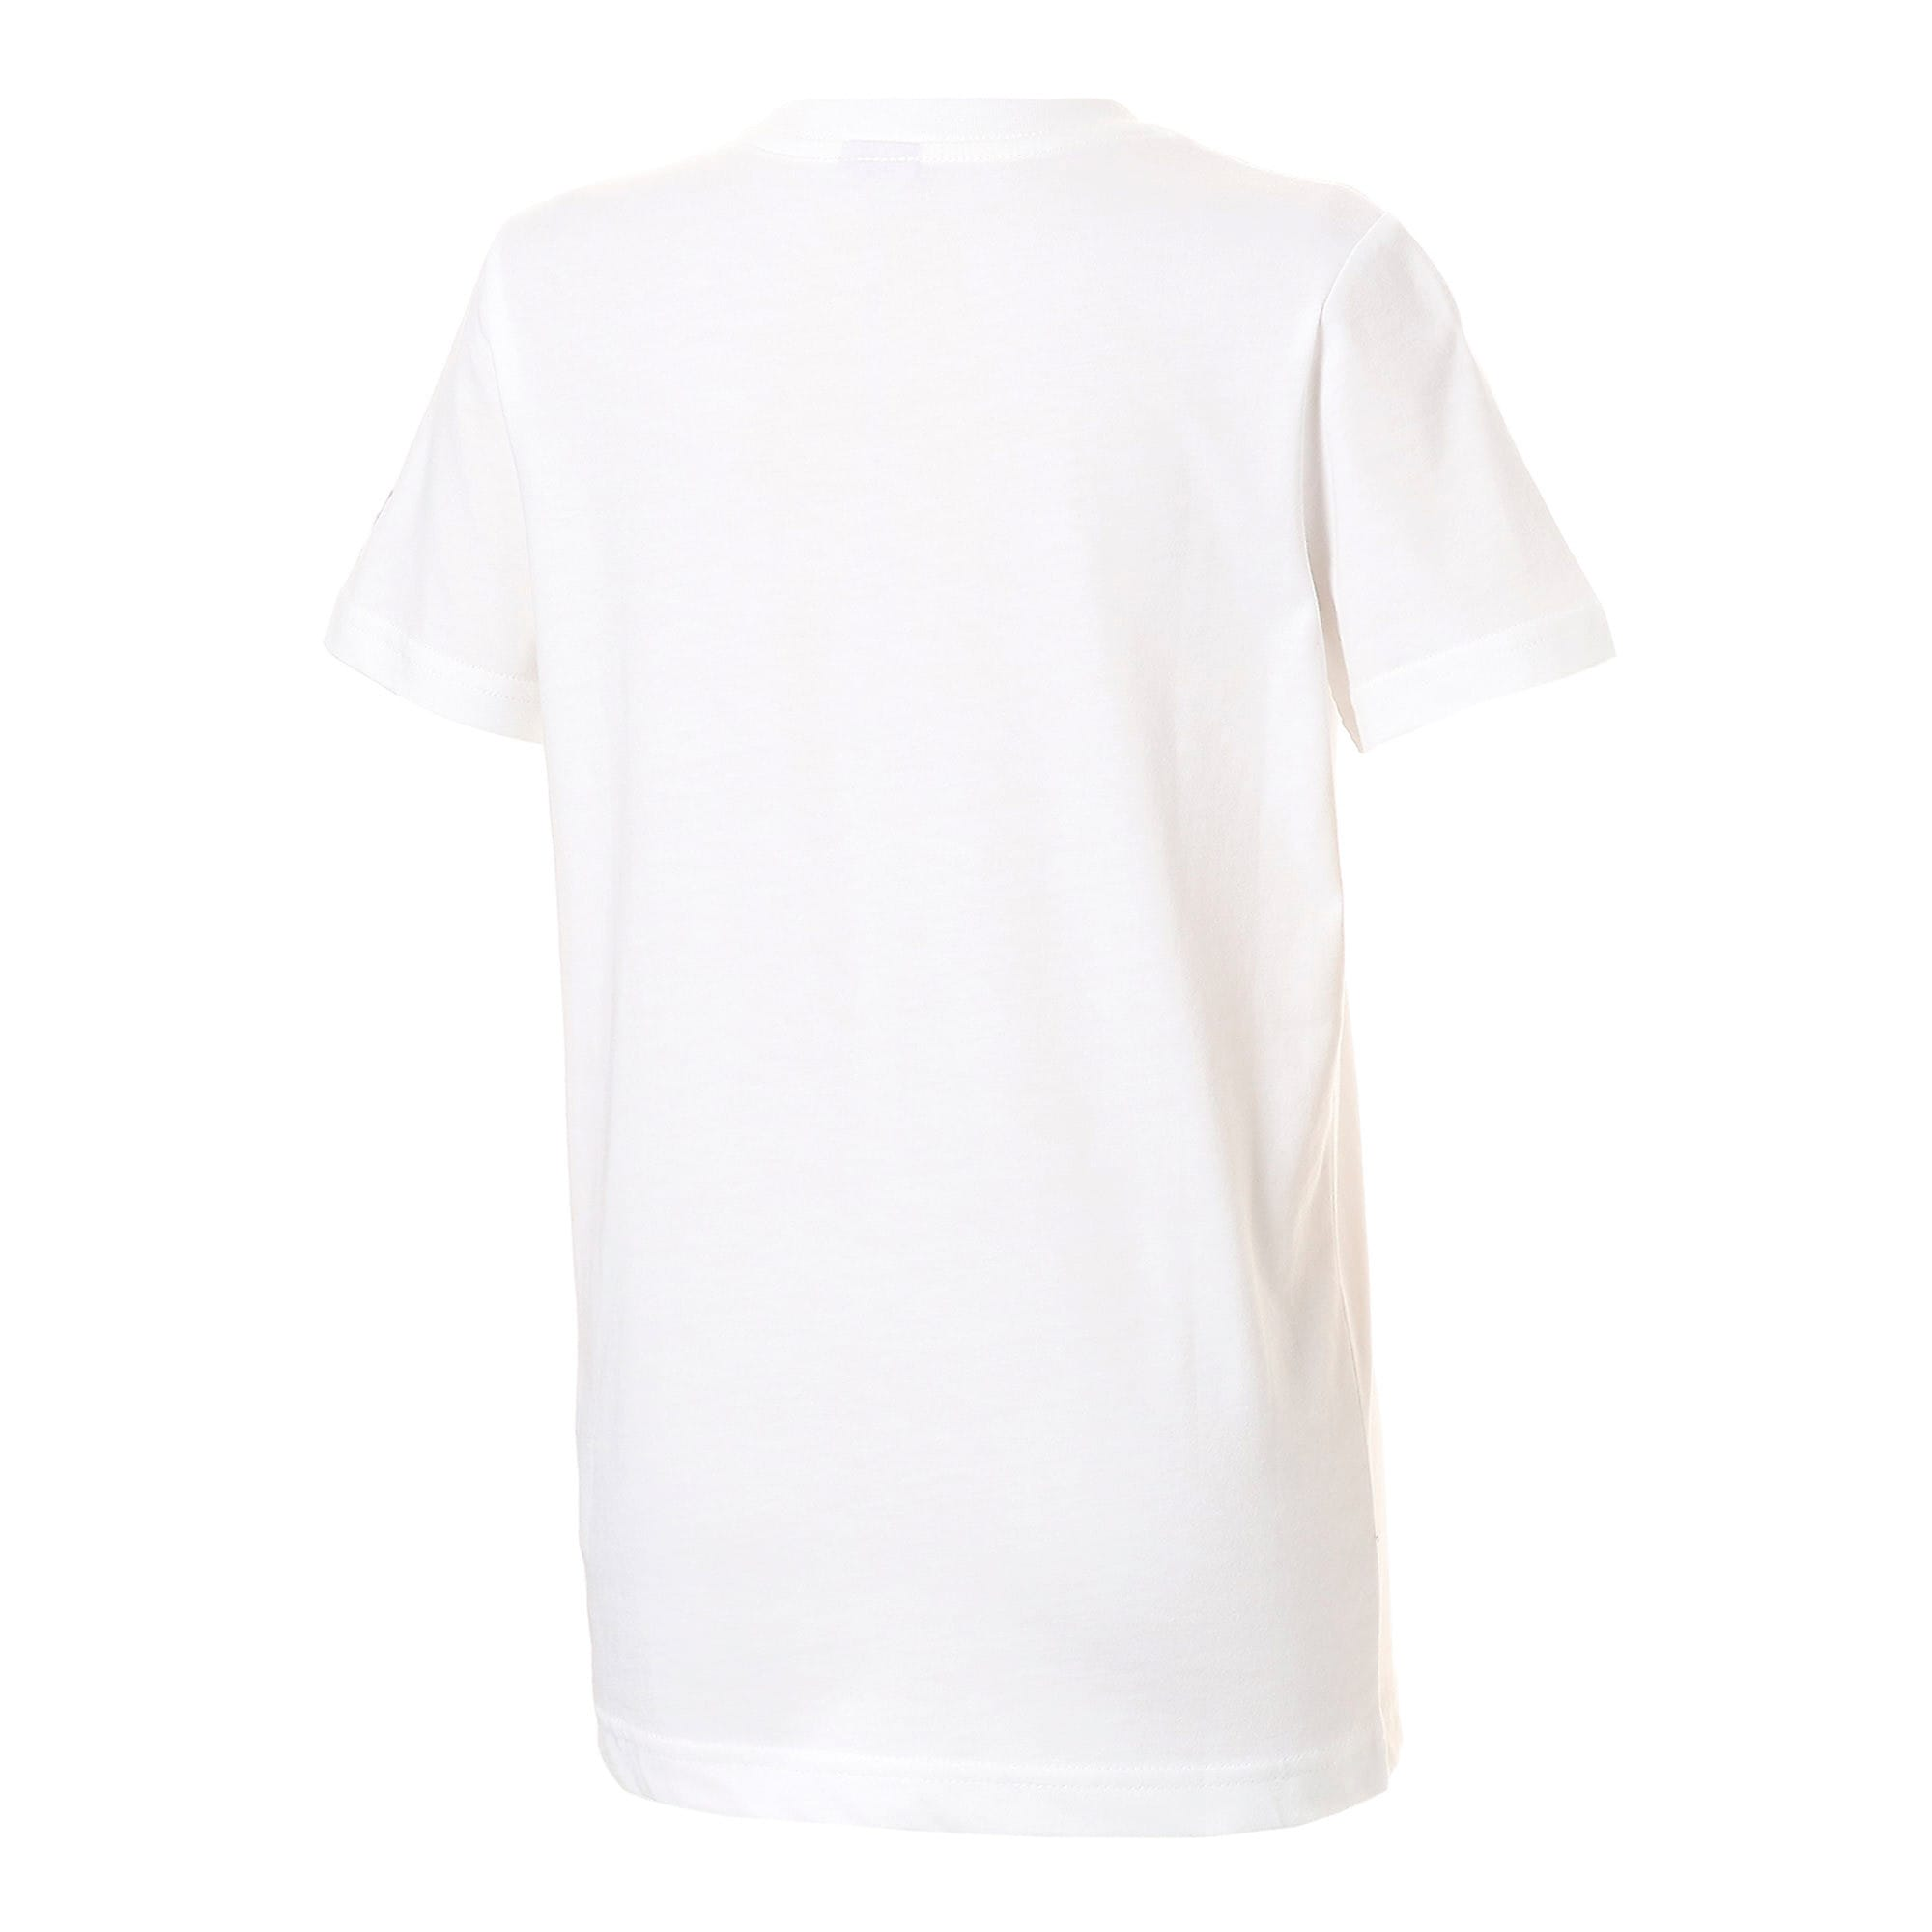 Thumbnail 3 of キッズ シティー 半袖 Tシャツ TOKYO 東京, Puma White, medium-JPN